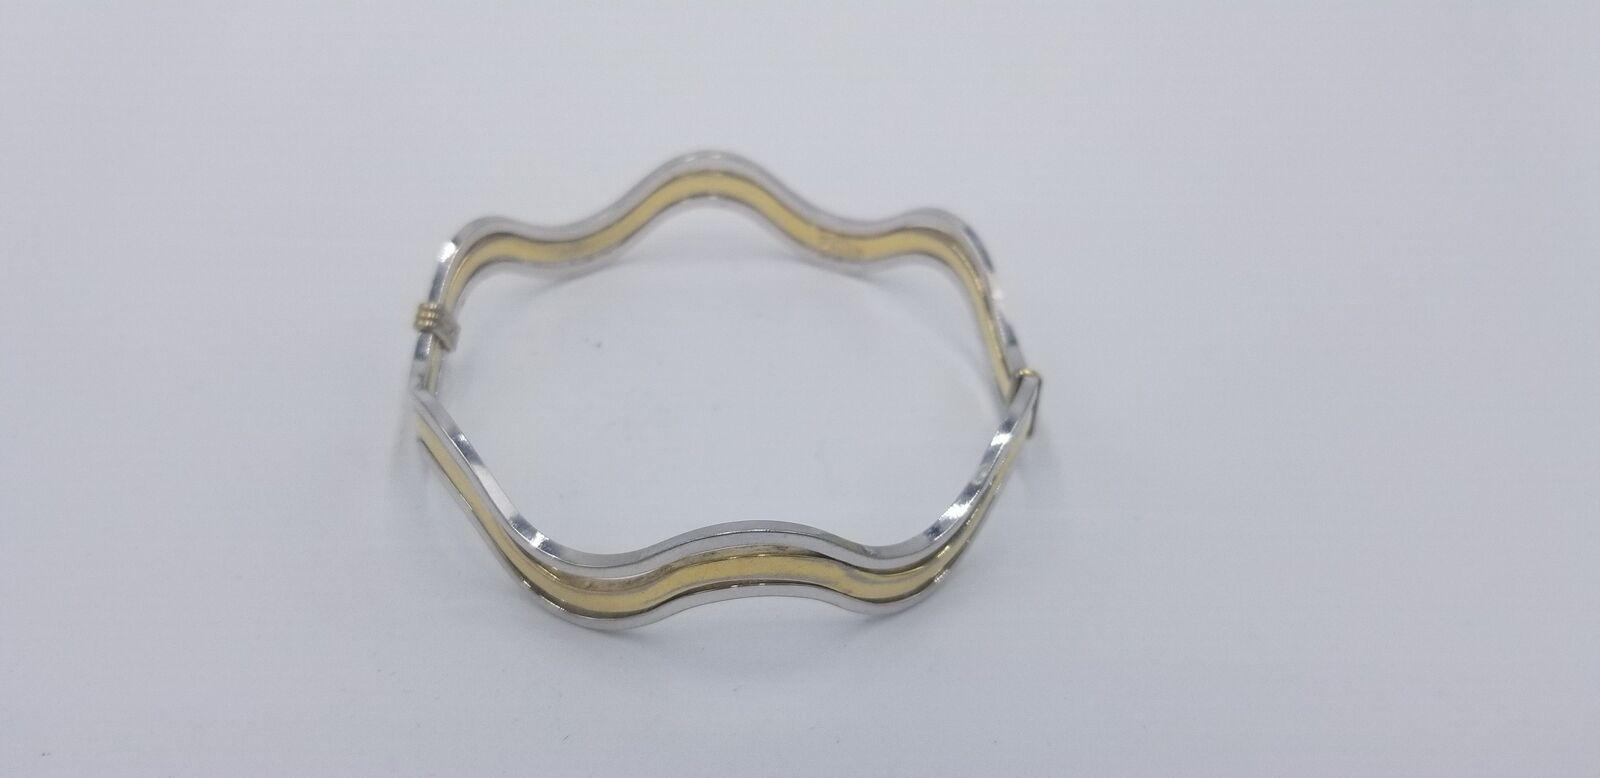 Vintage Signed Avon Silver And Gold Tone Wavy Style No Clasp Bracelet EUC image 4